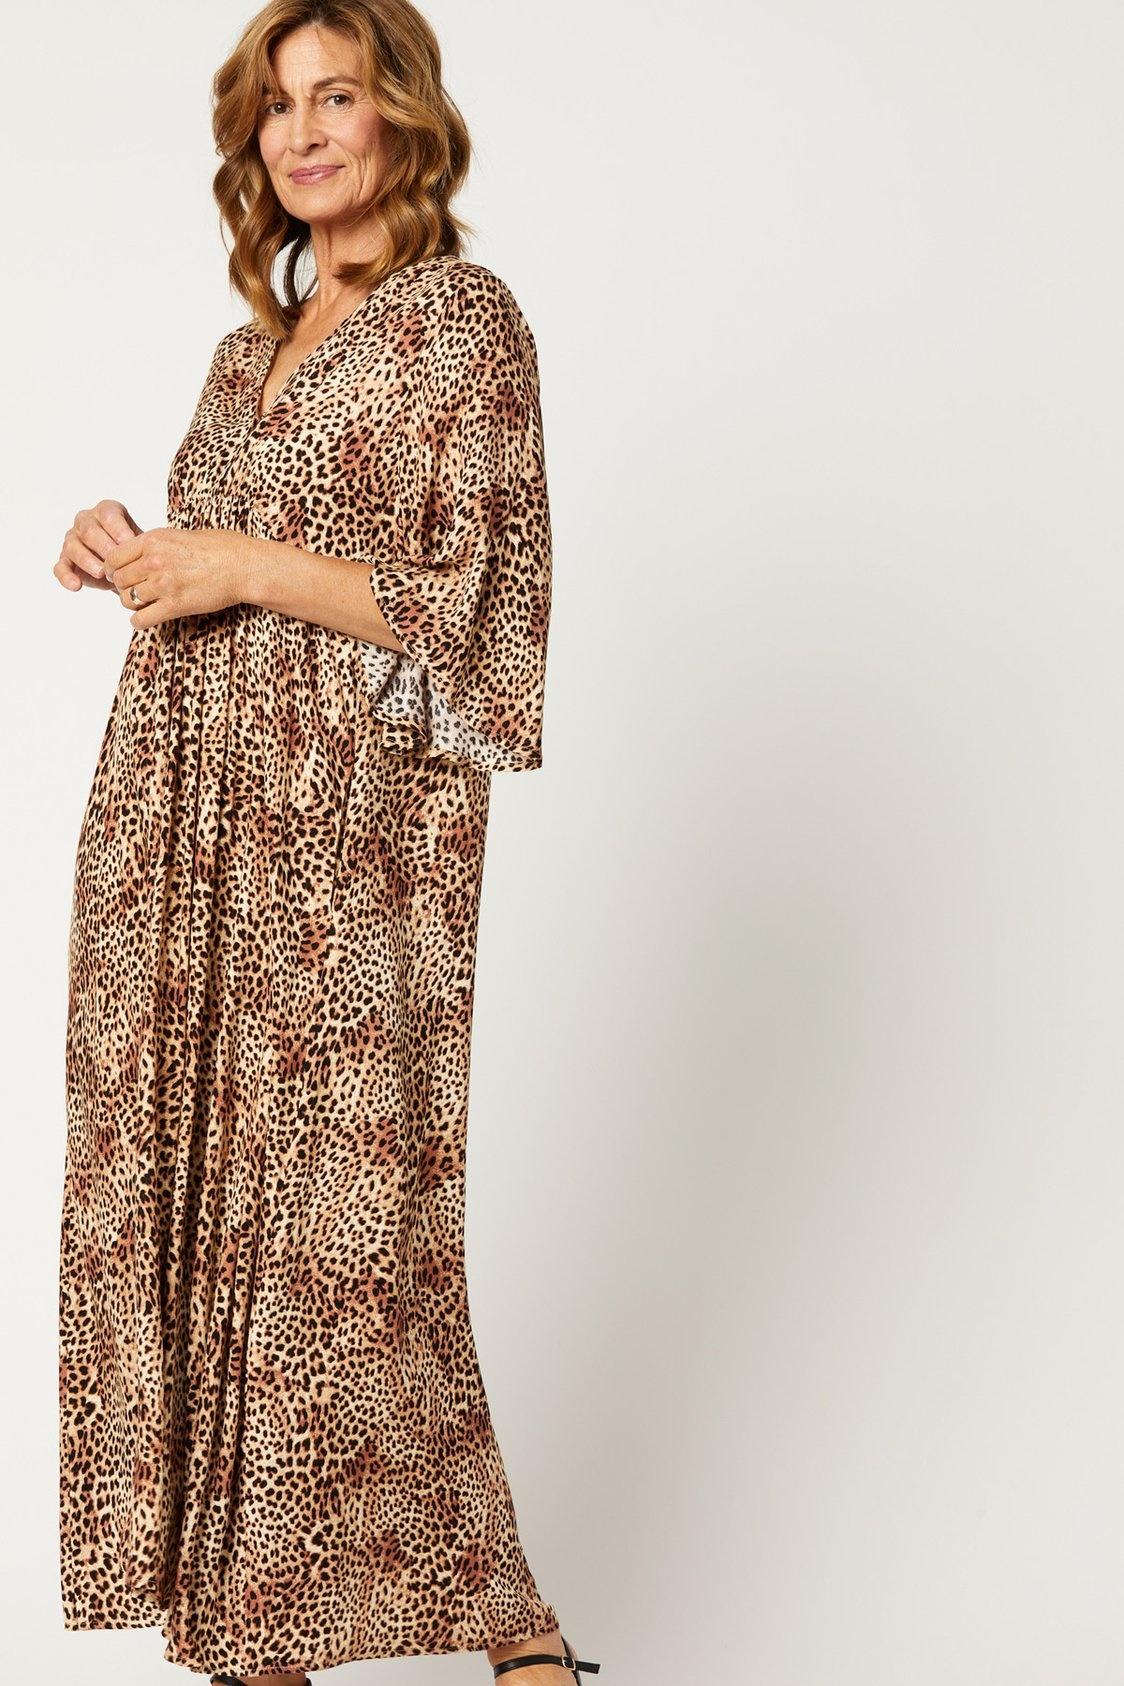 Eb & Ive Amazonia Maxi Dress OS